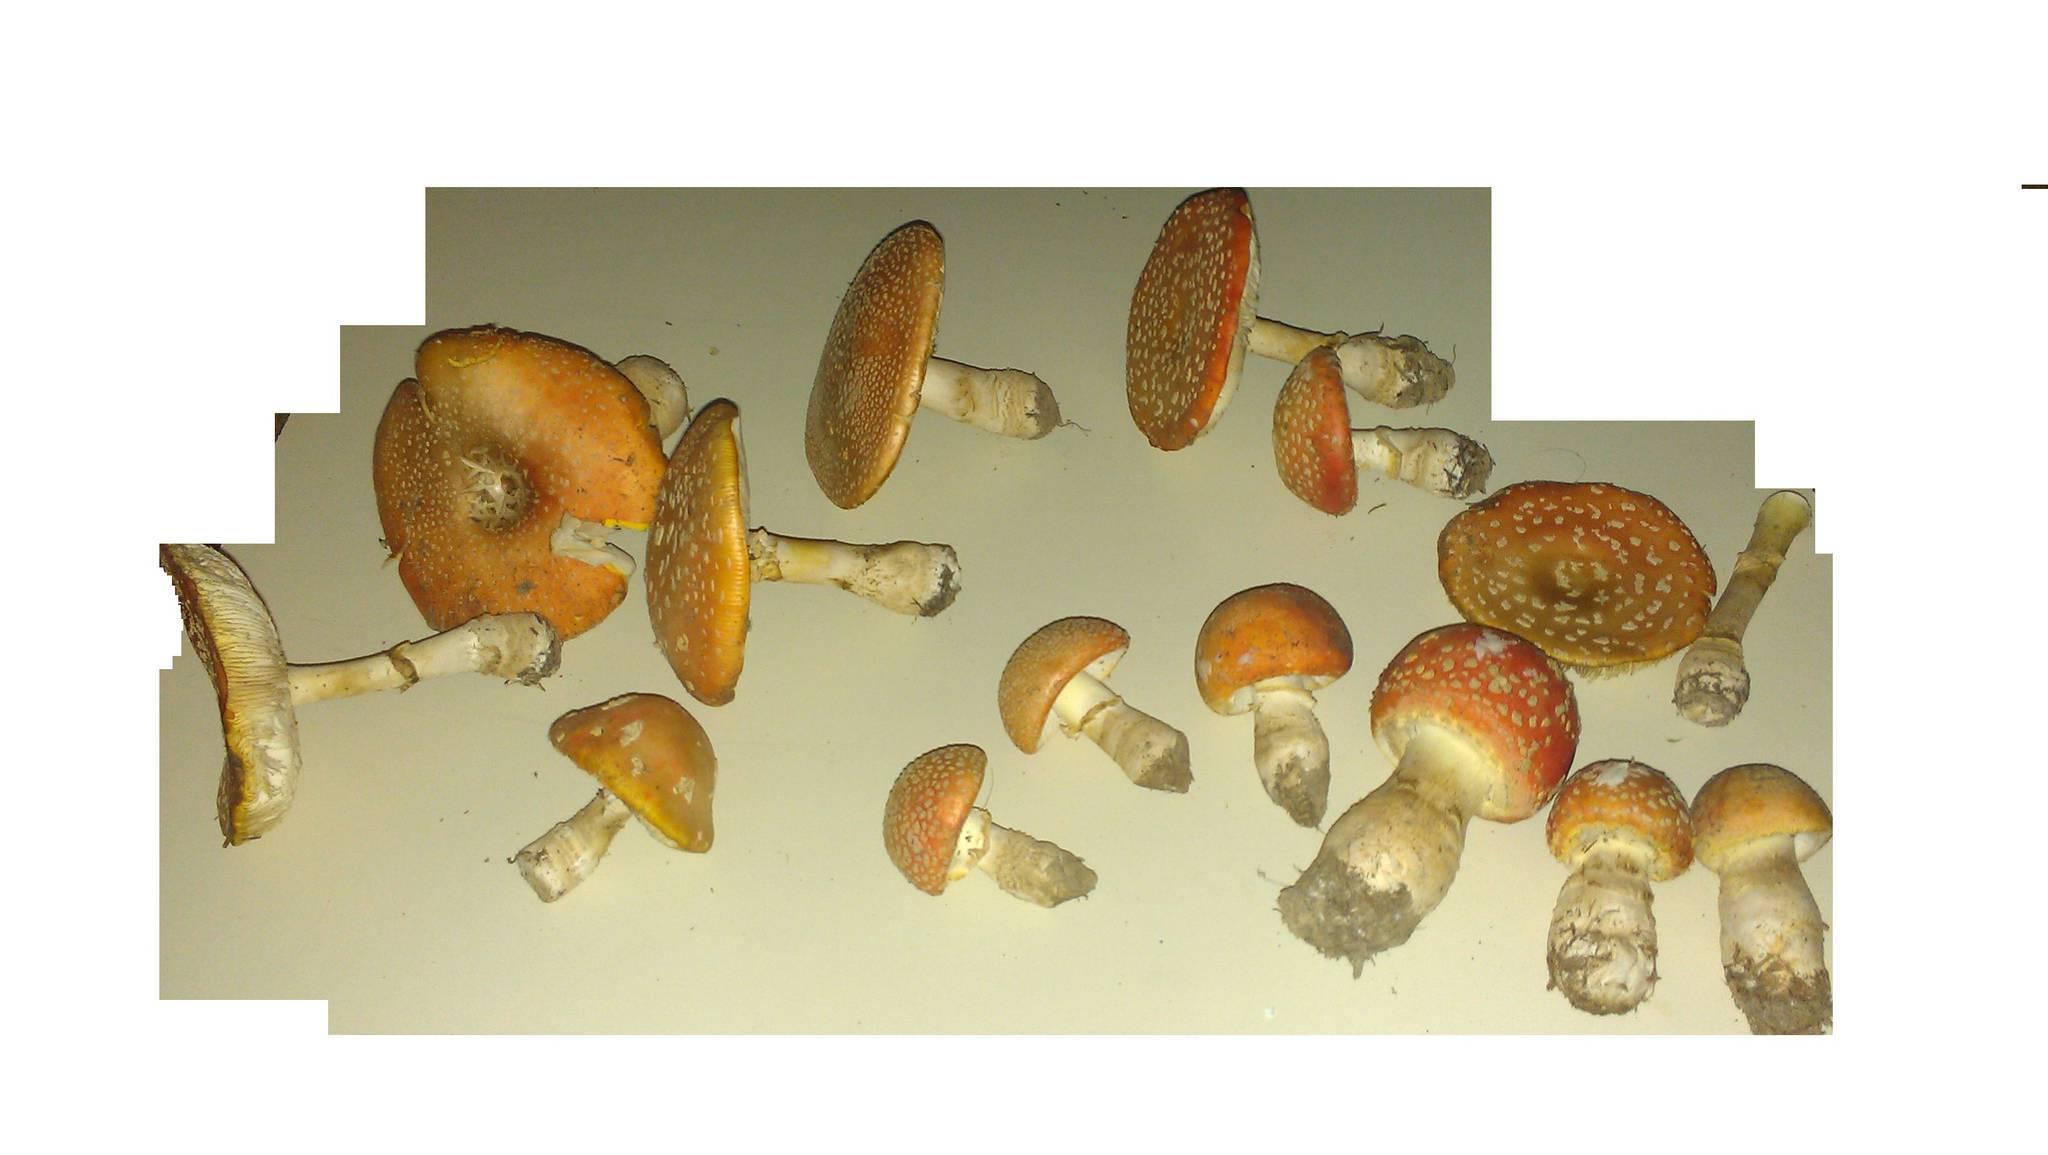 Amanita Id request [Dec 10] - Mushroom Hunting and